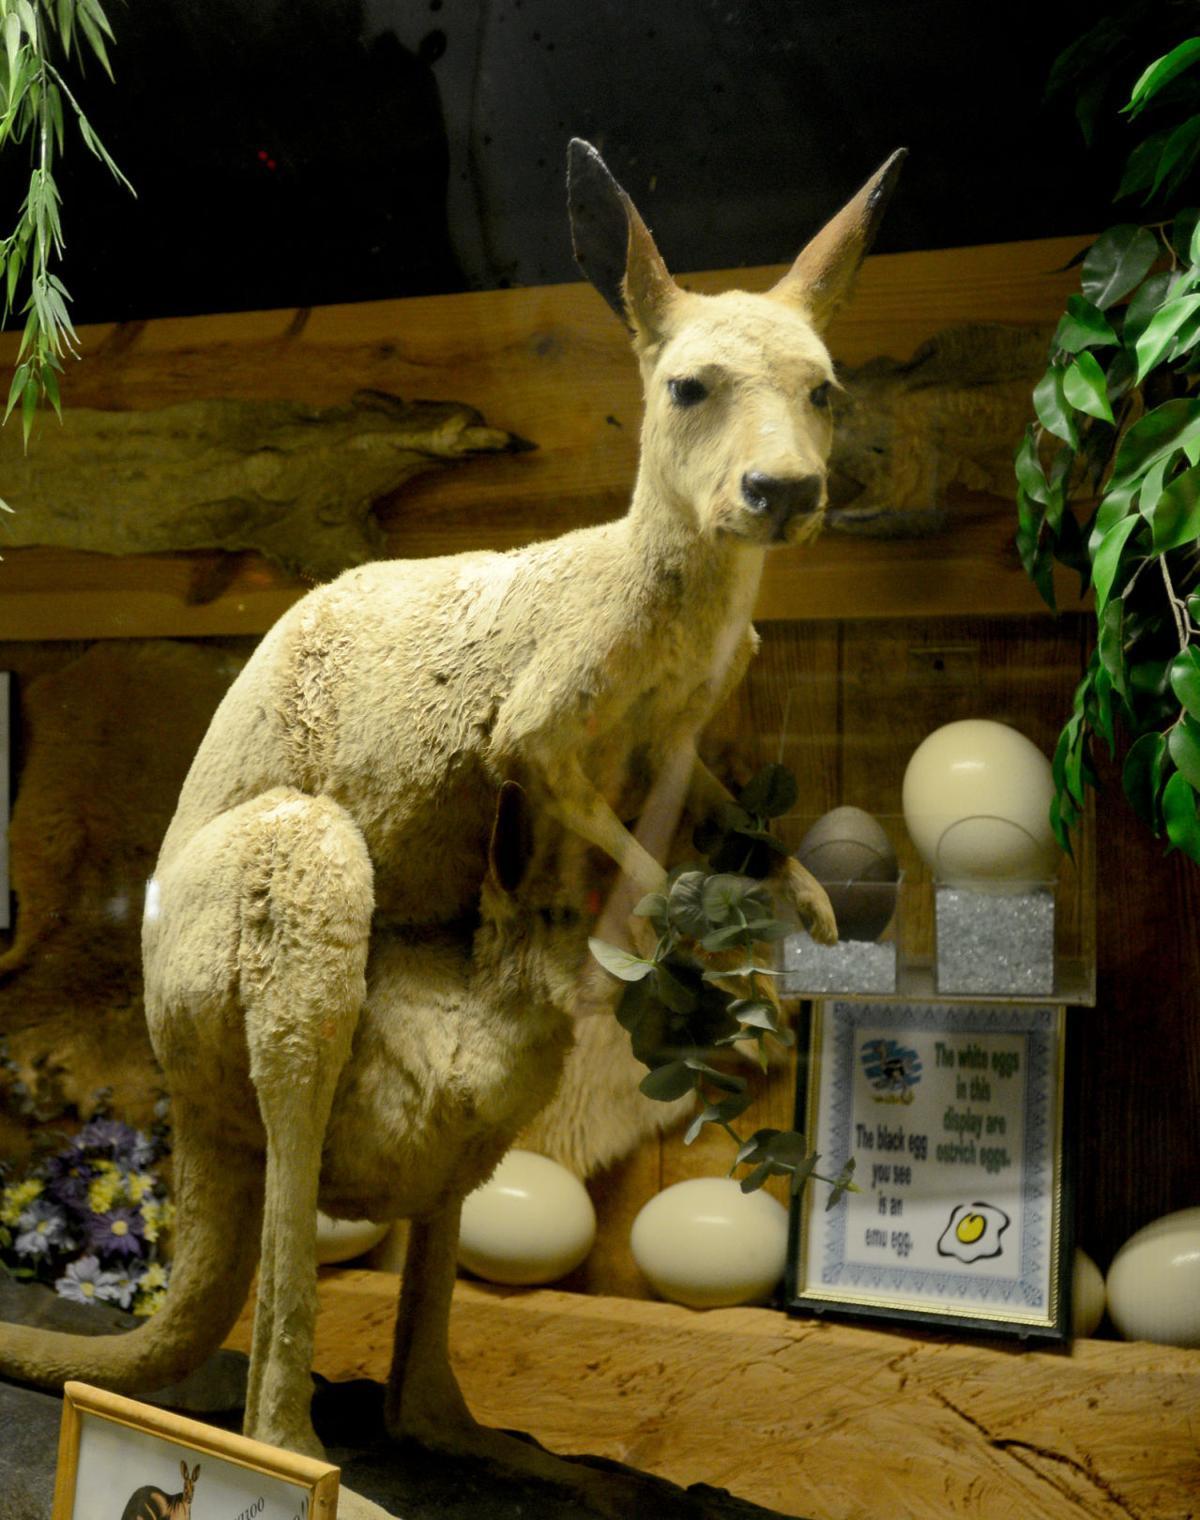 Stuff Kangaroo